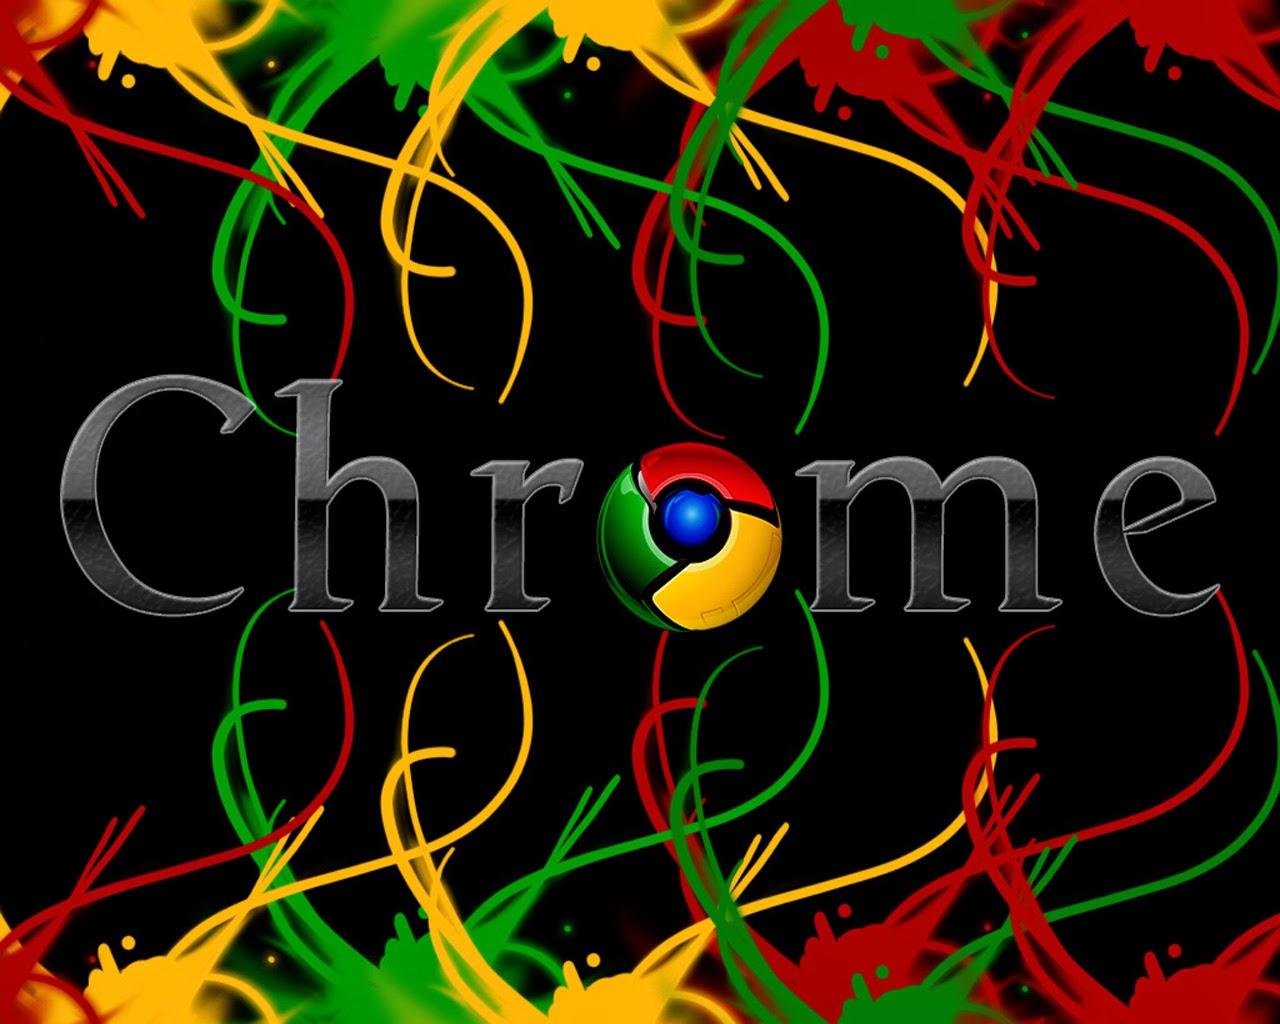 Hd Wallpapers Blog: Google Chrome Wallpapers